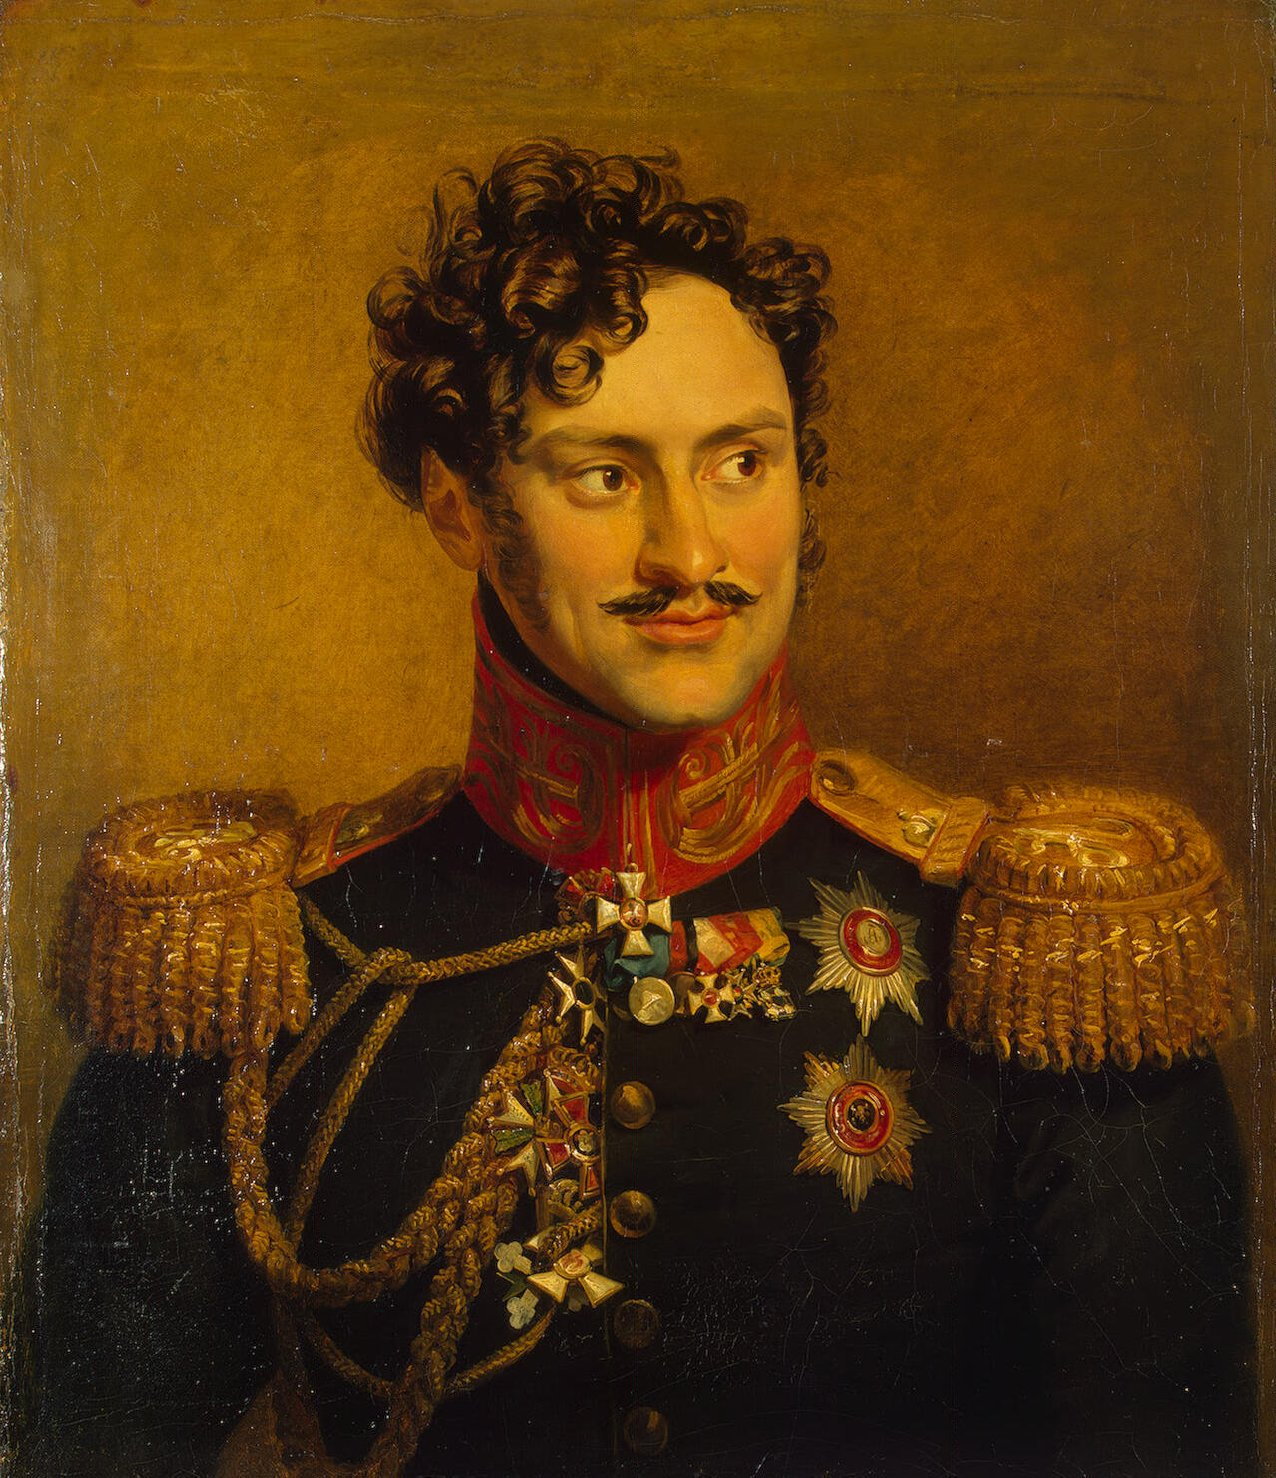 Доу, Джордж - Портрет Александра Ивановича Чернышева.